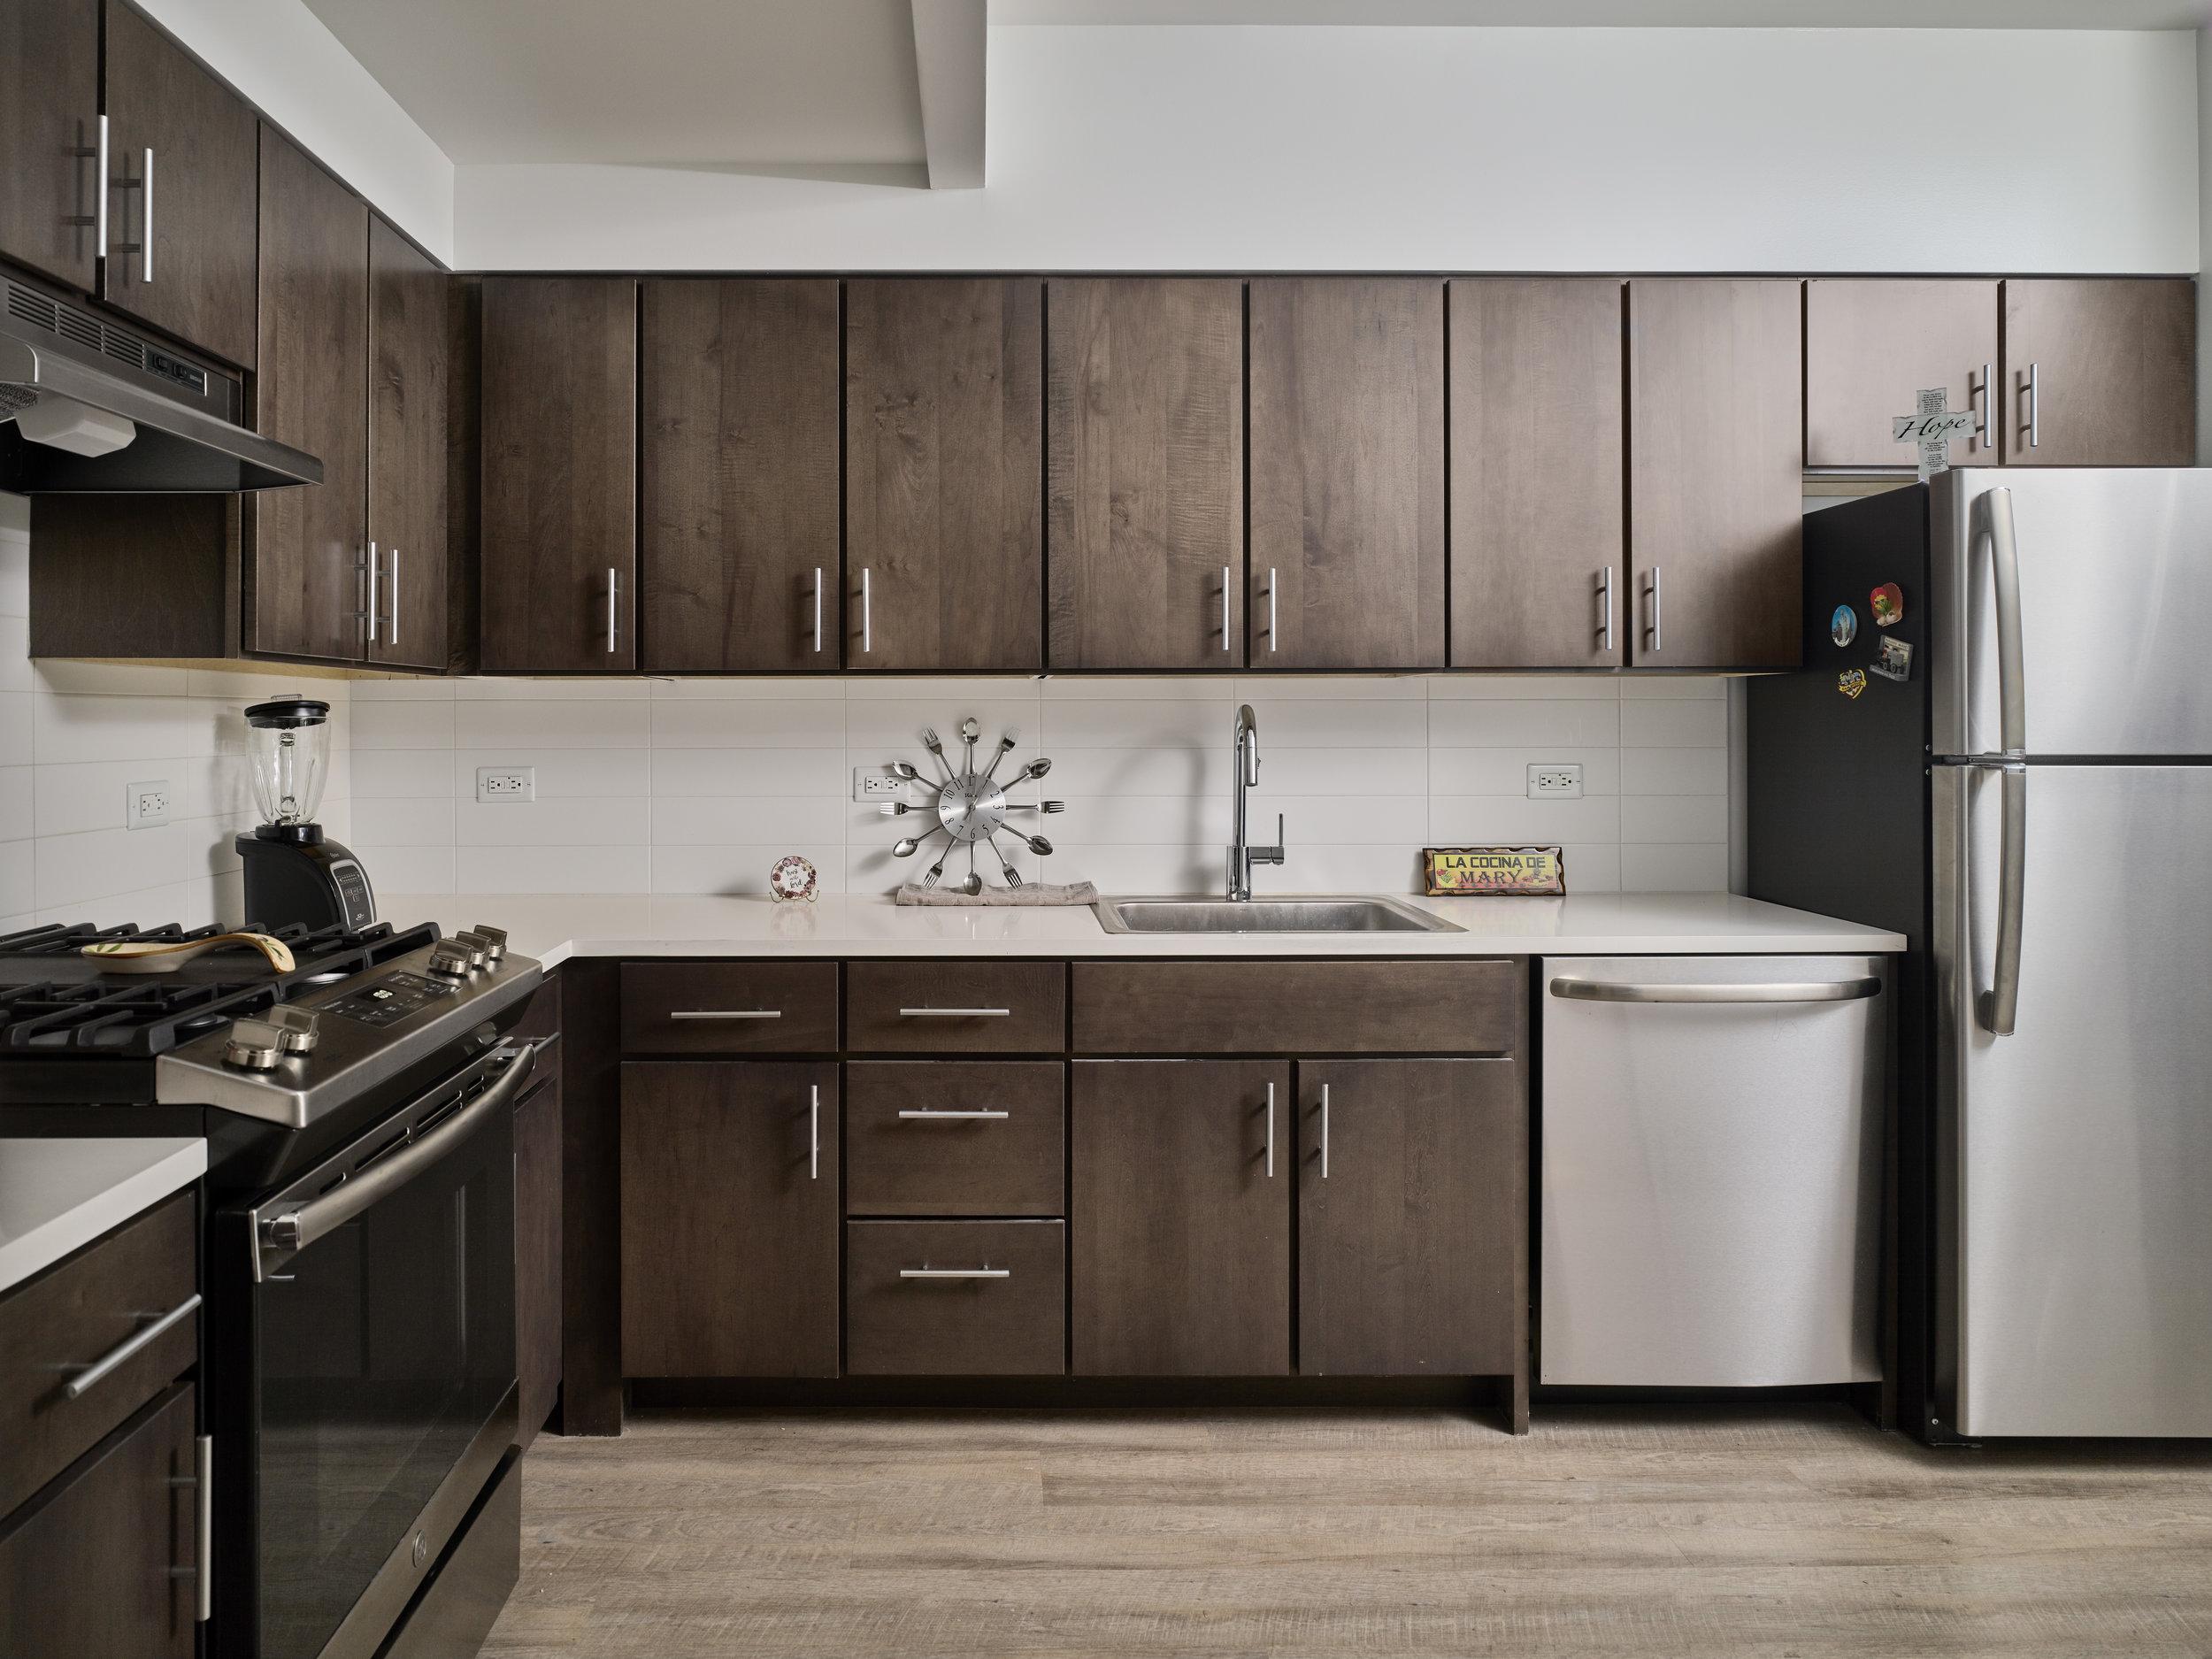 Typical Unit Kitchen